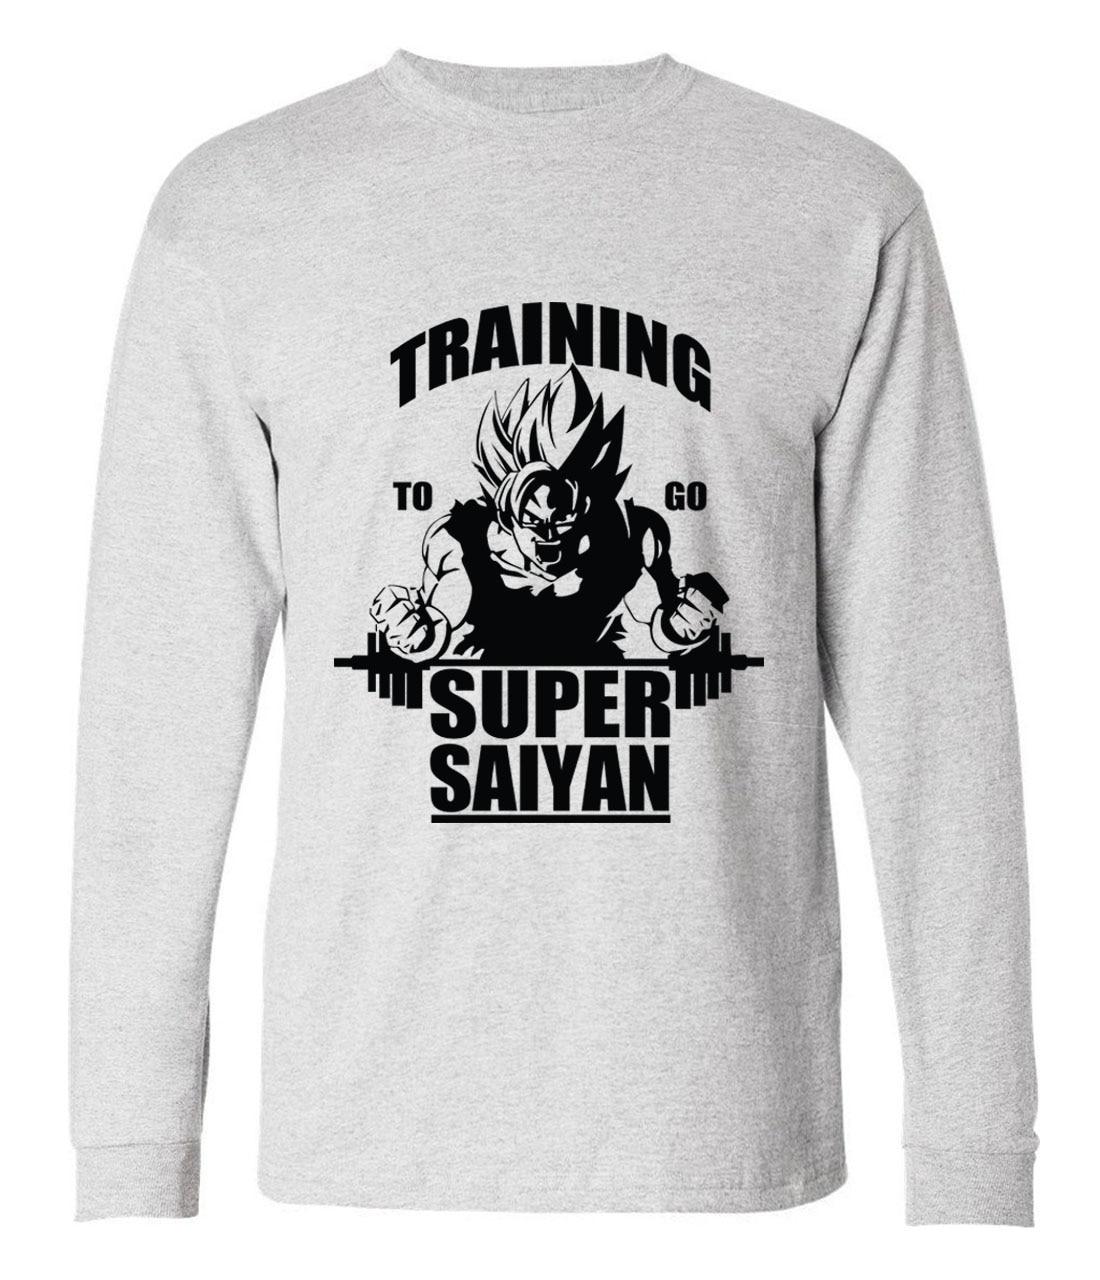 Fashion Dragon Ball Z Super Saiyan long sleeve t shirt men 2017 autumn novelty hip hop